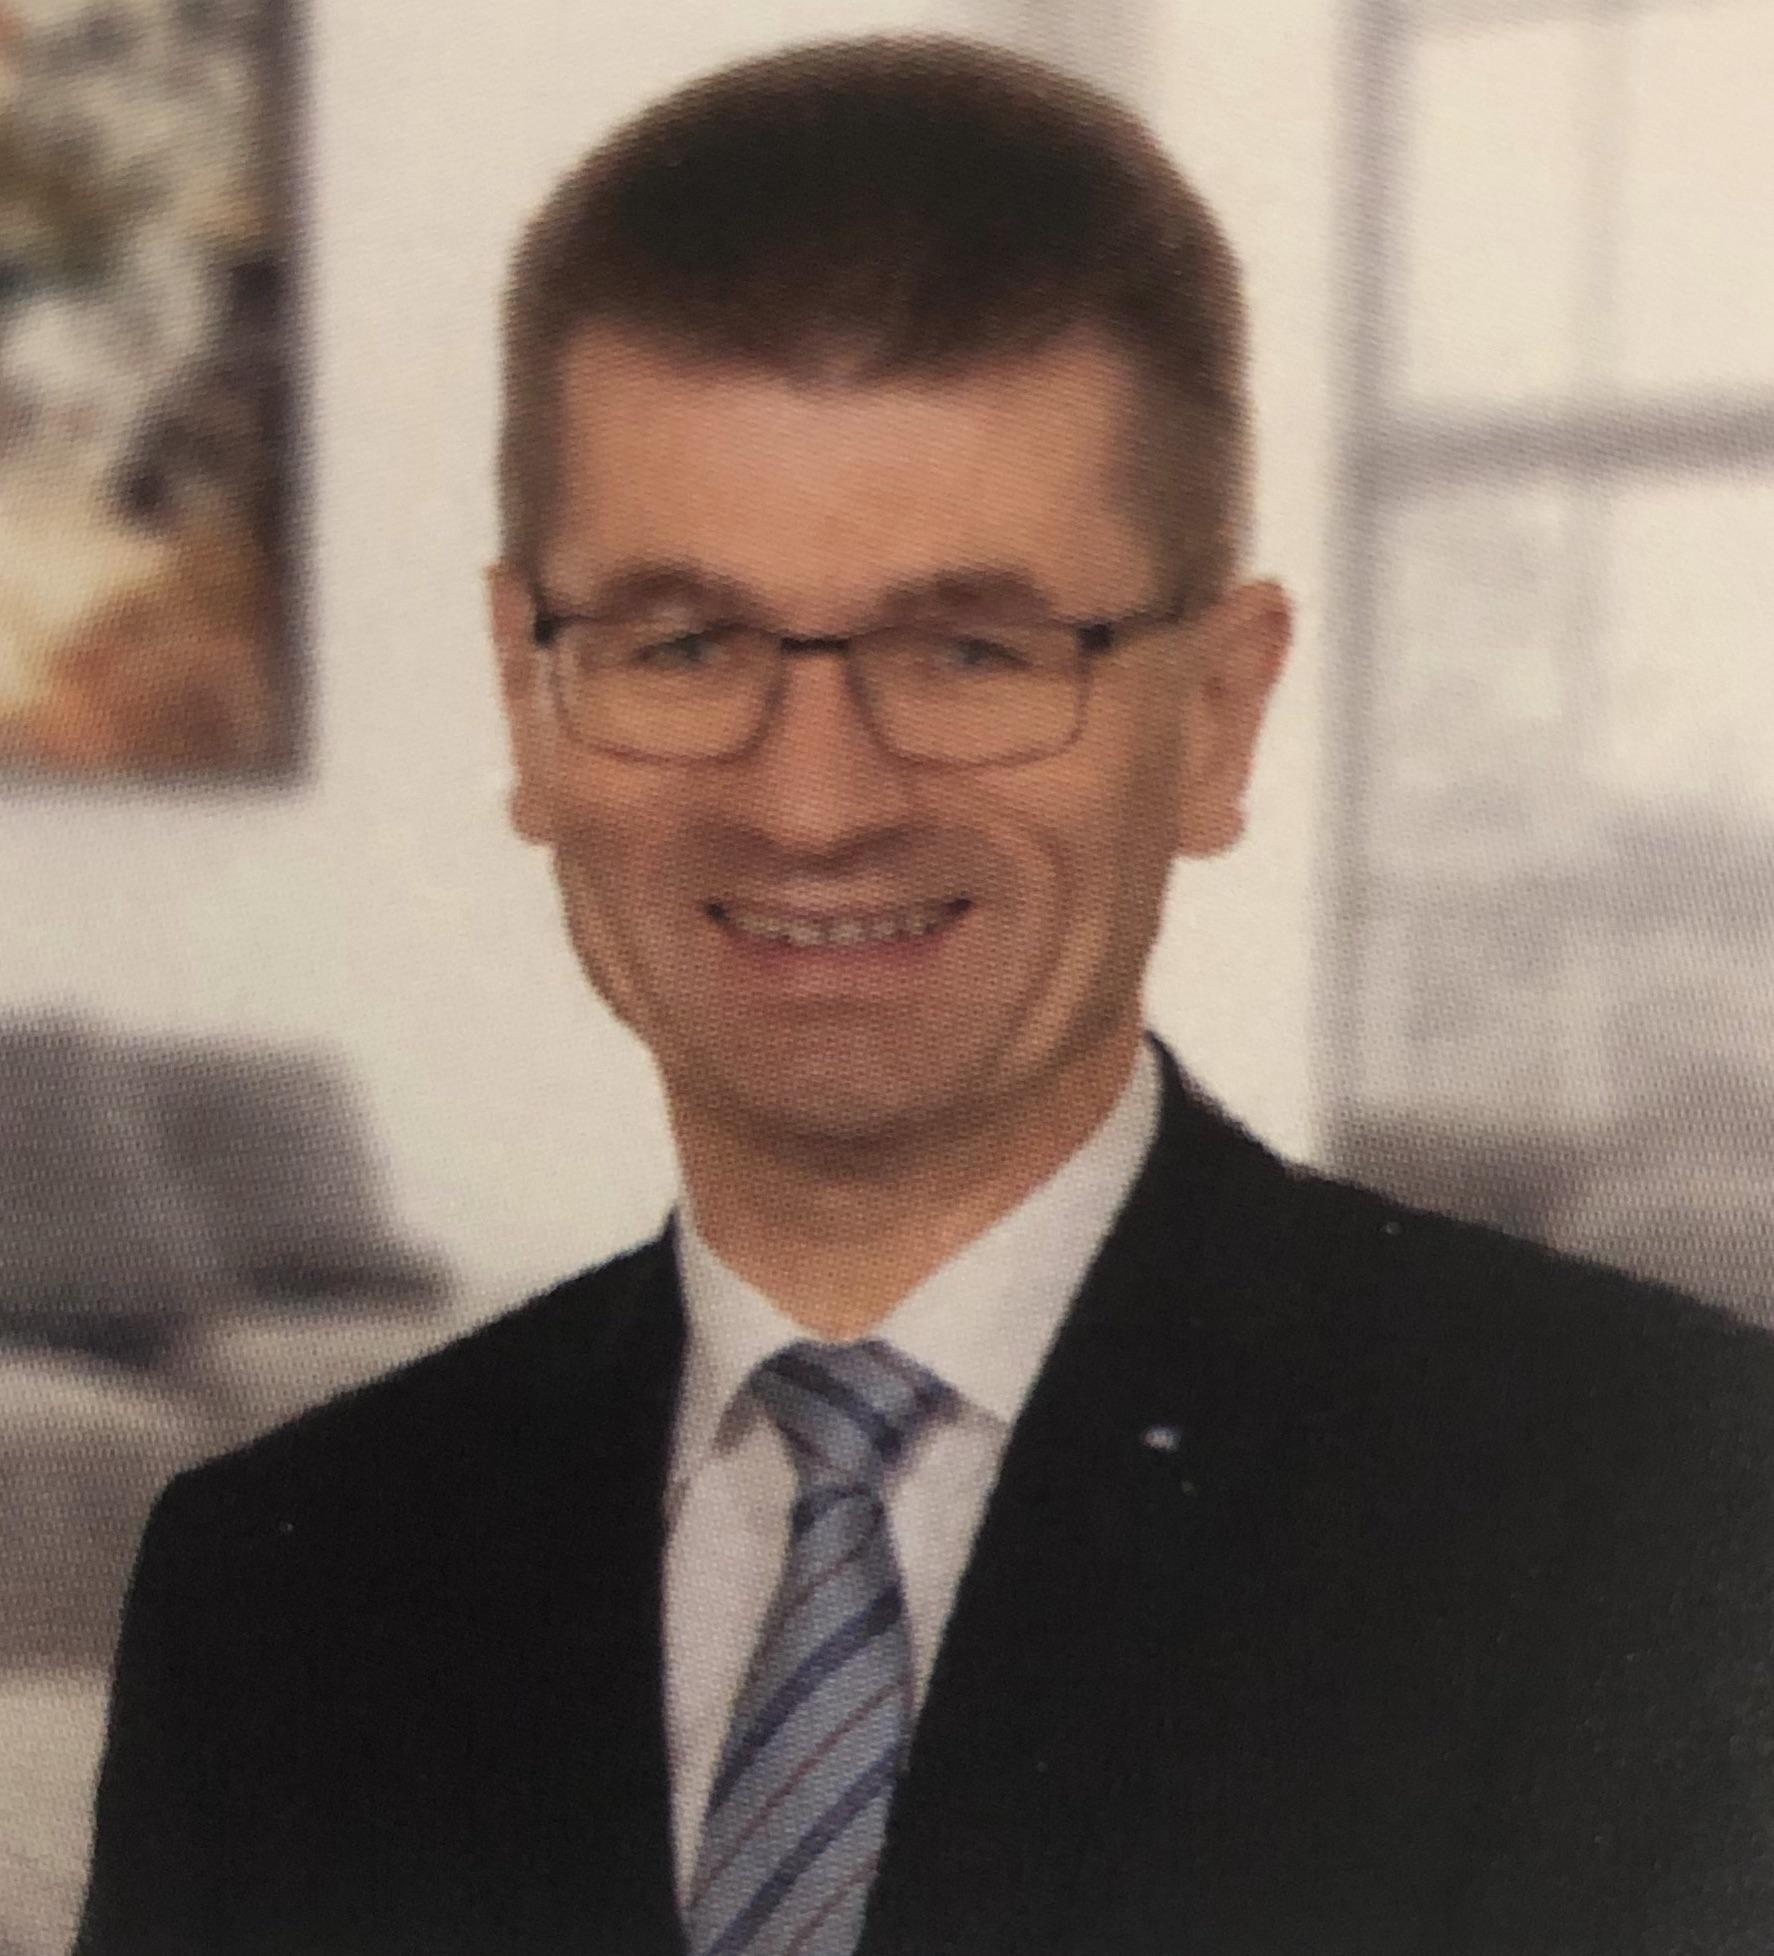 Gerhard Walther